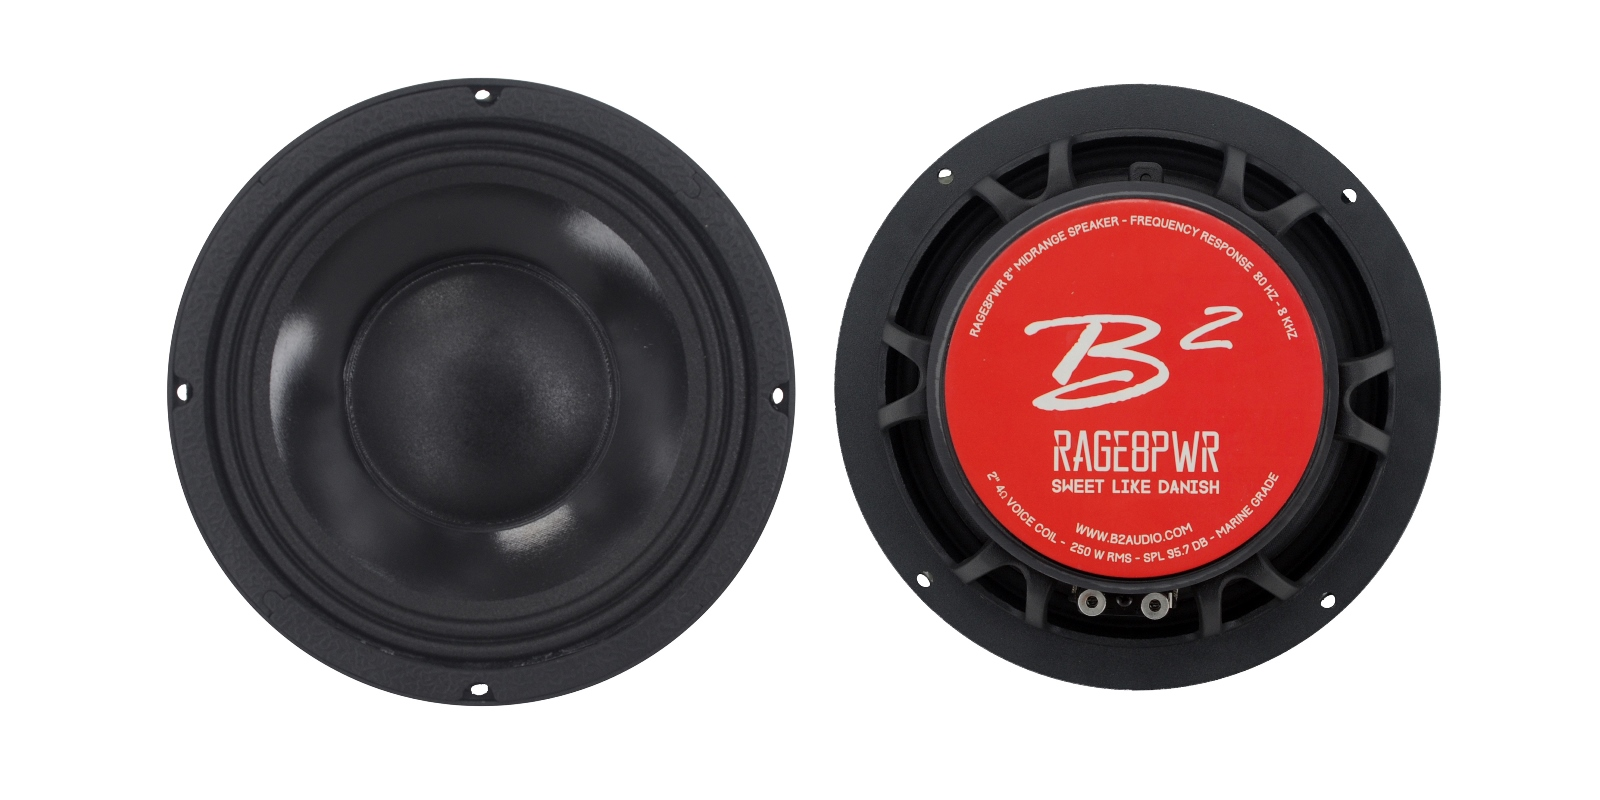 B2 audio RAGE8PWR